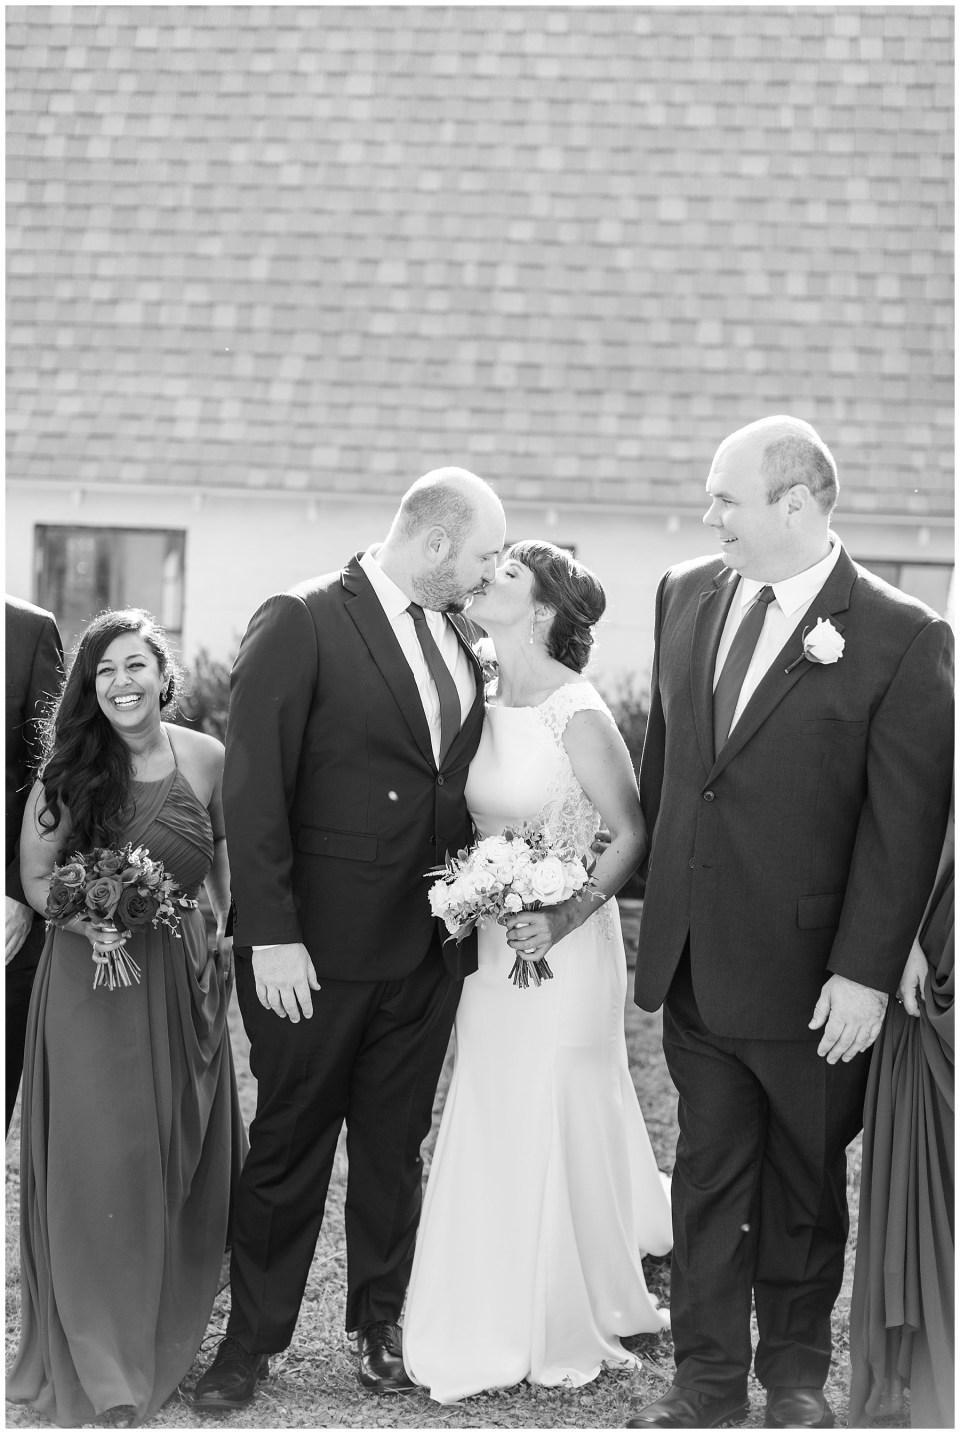 48-fields-leesburg-wedding-photos-northern-virginia-wedding-photographer-fall-wedding-photo-38_photos.jpg